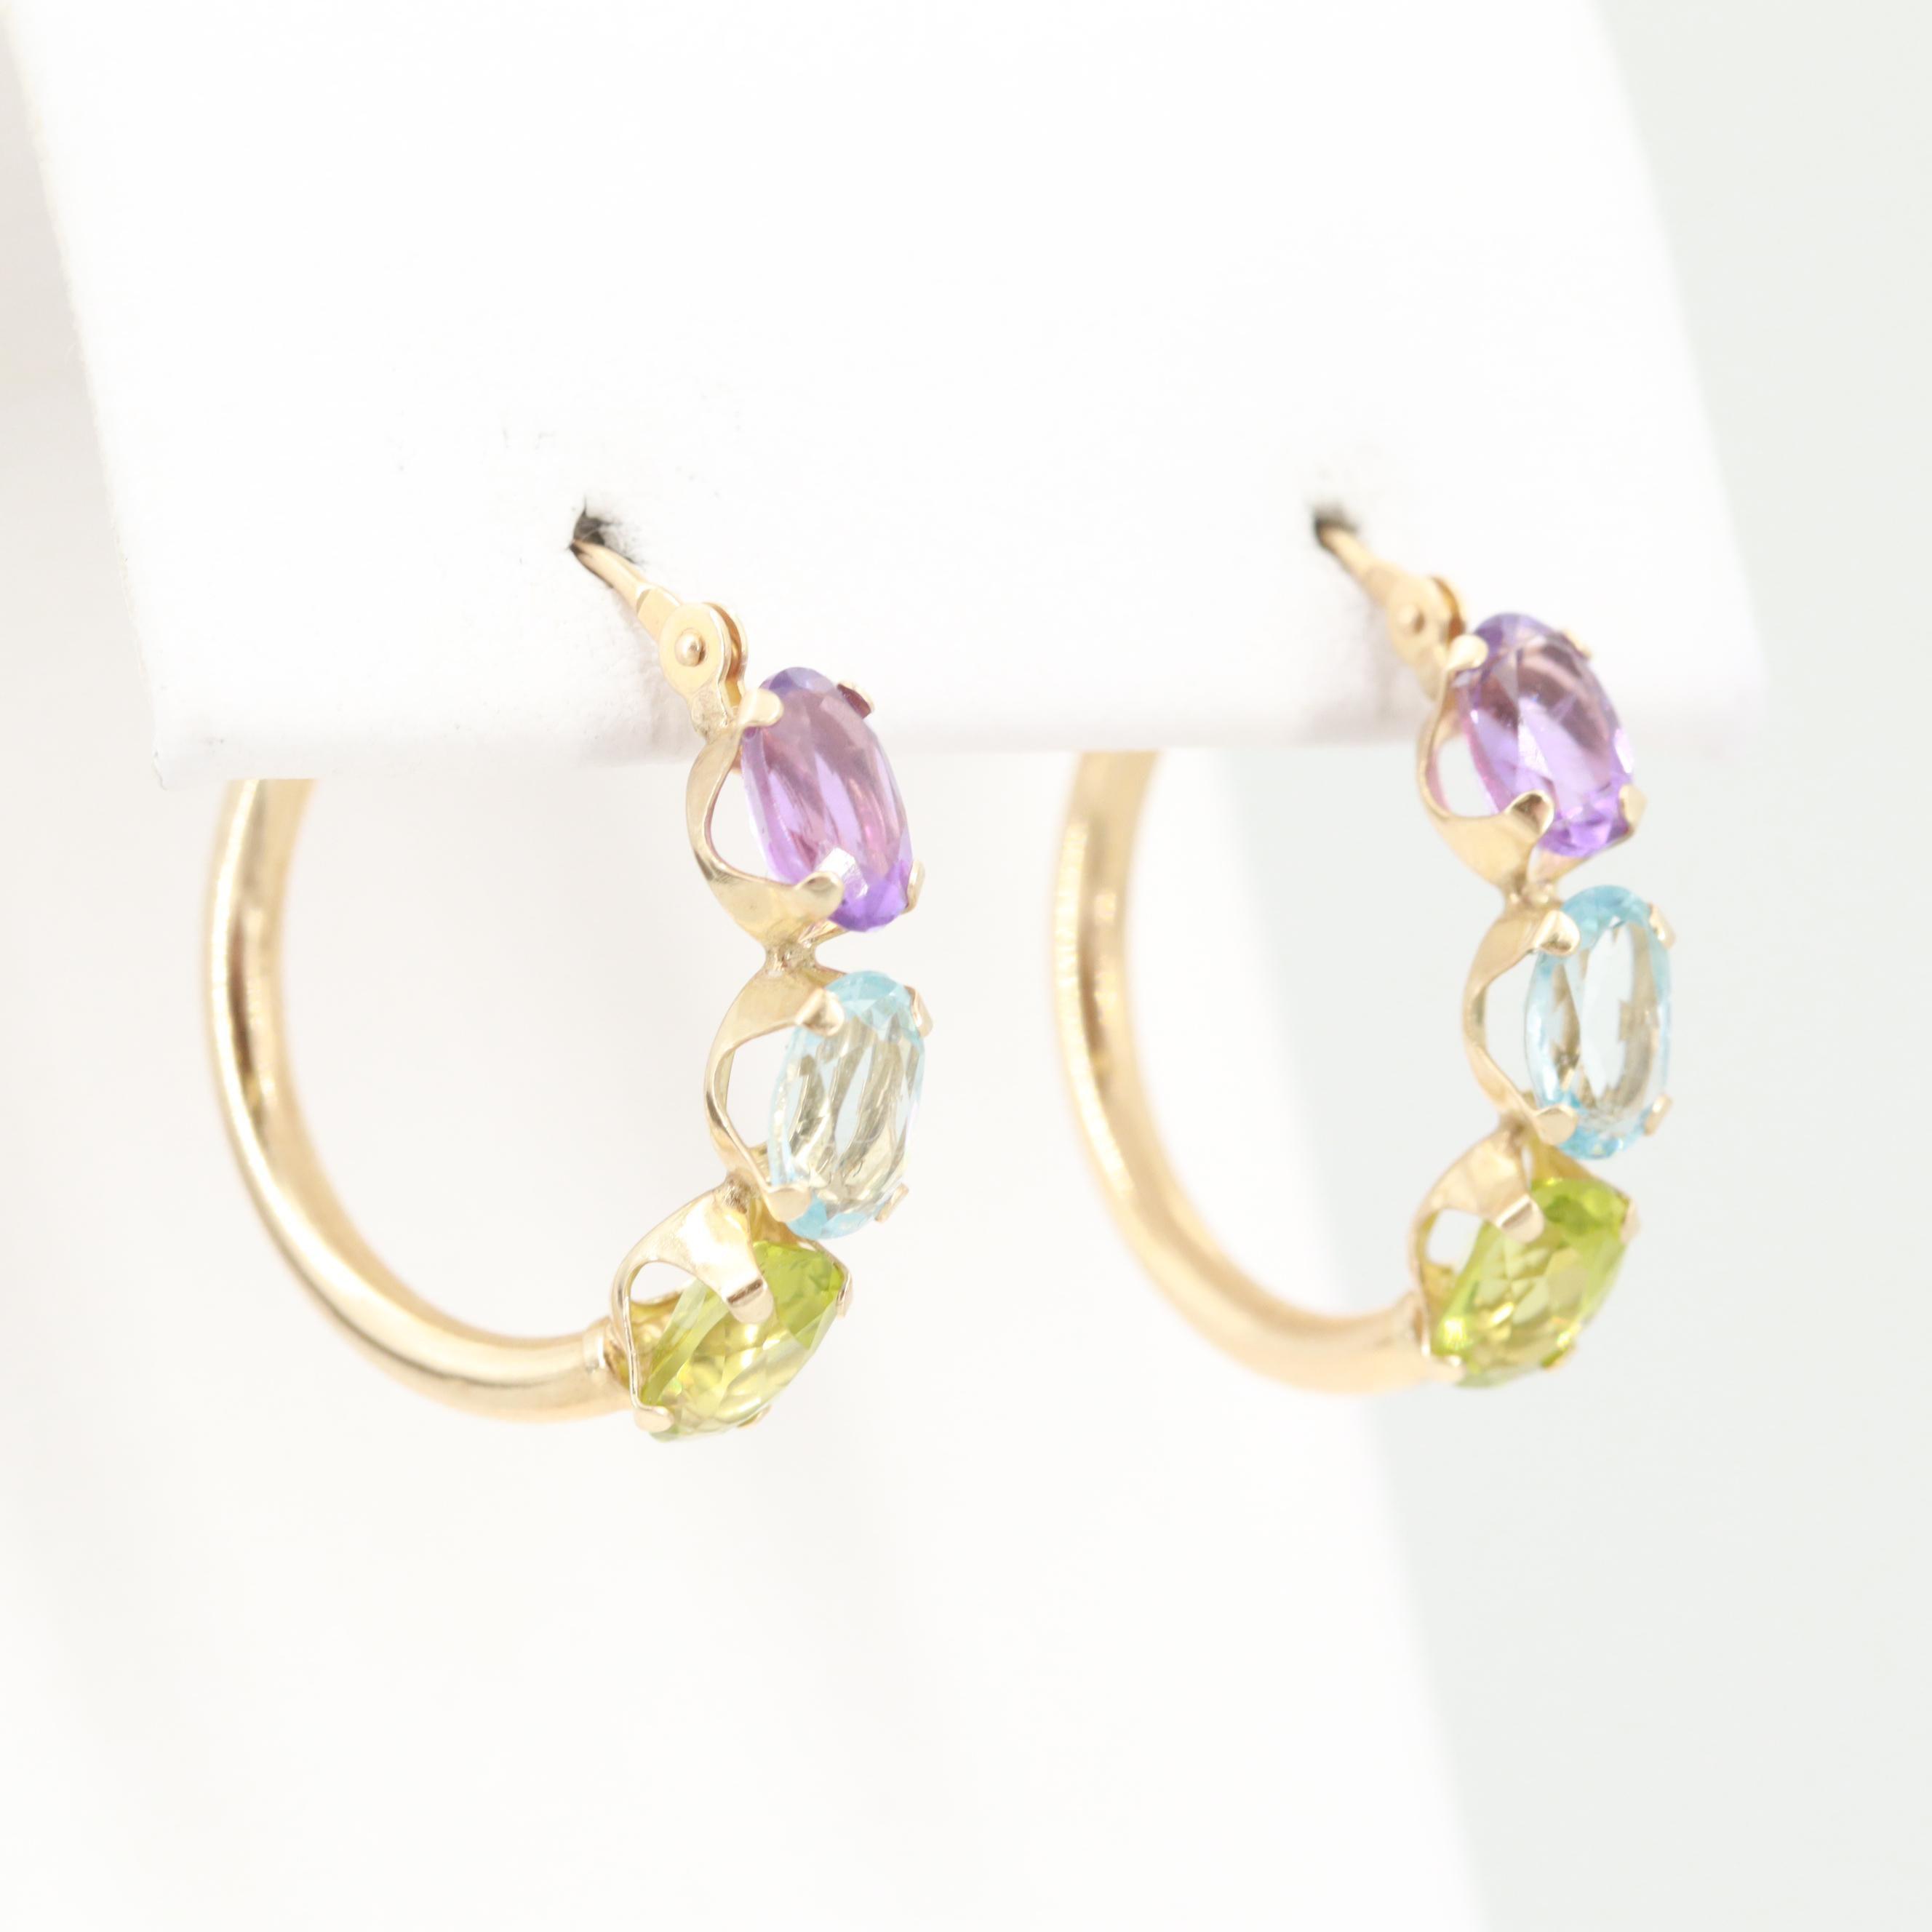 14K Yellow Gold Amethyst, Peridot and Blue Topaz Hoop Earrings